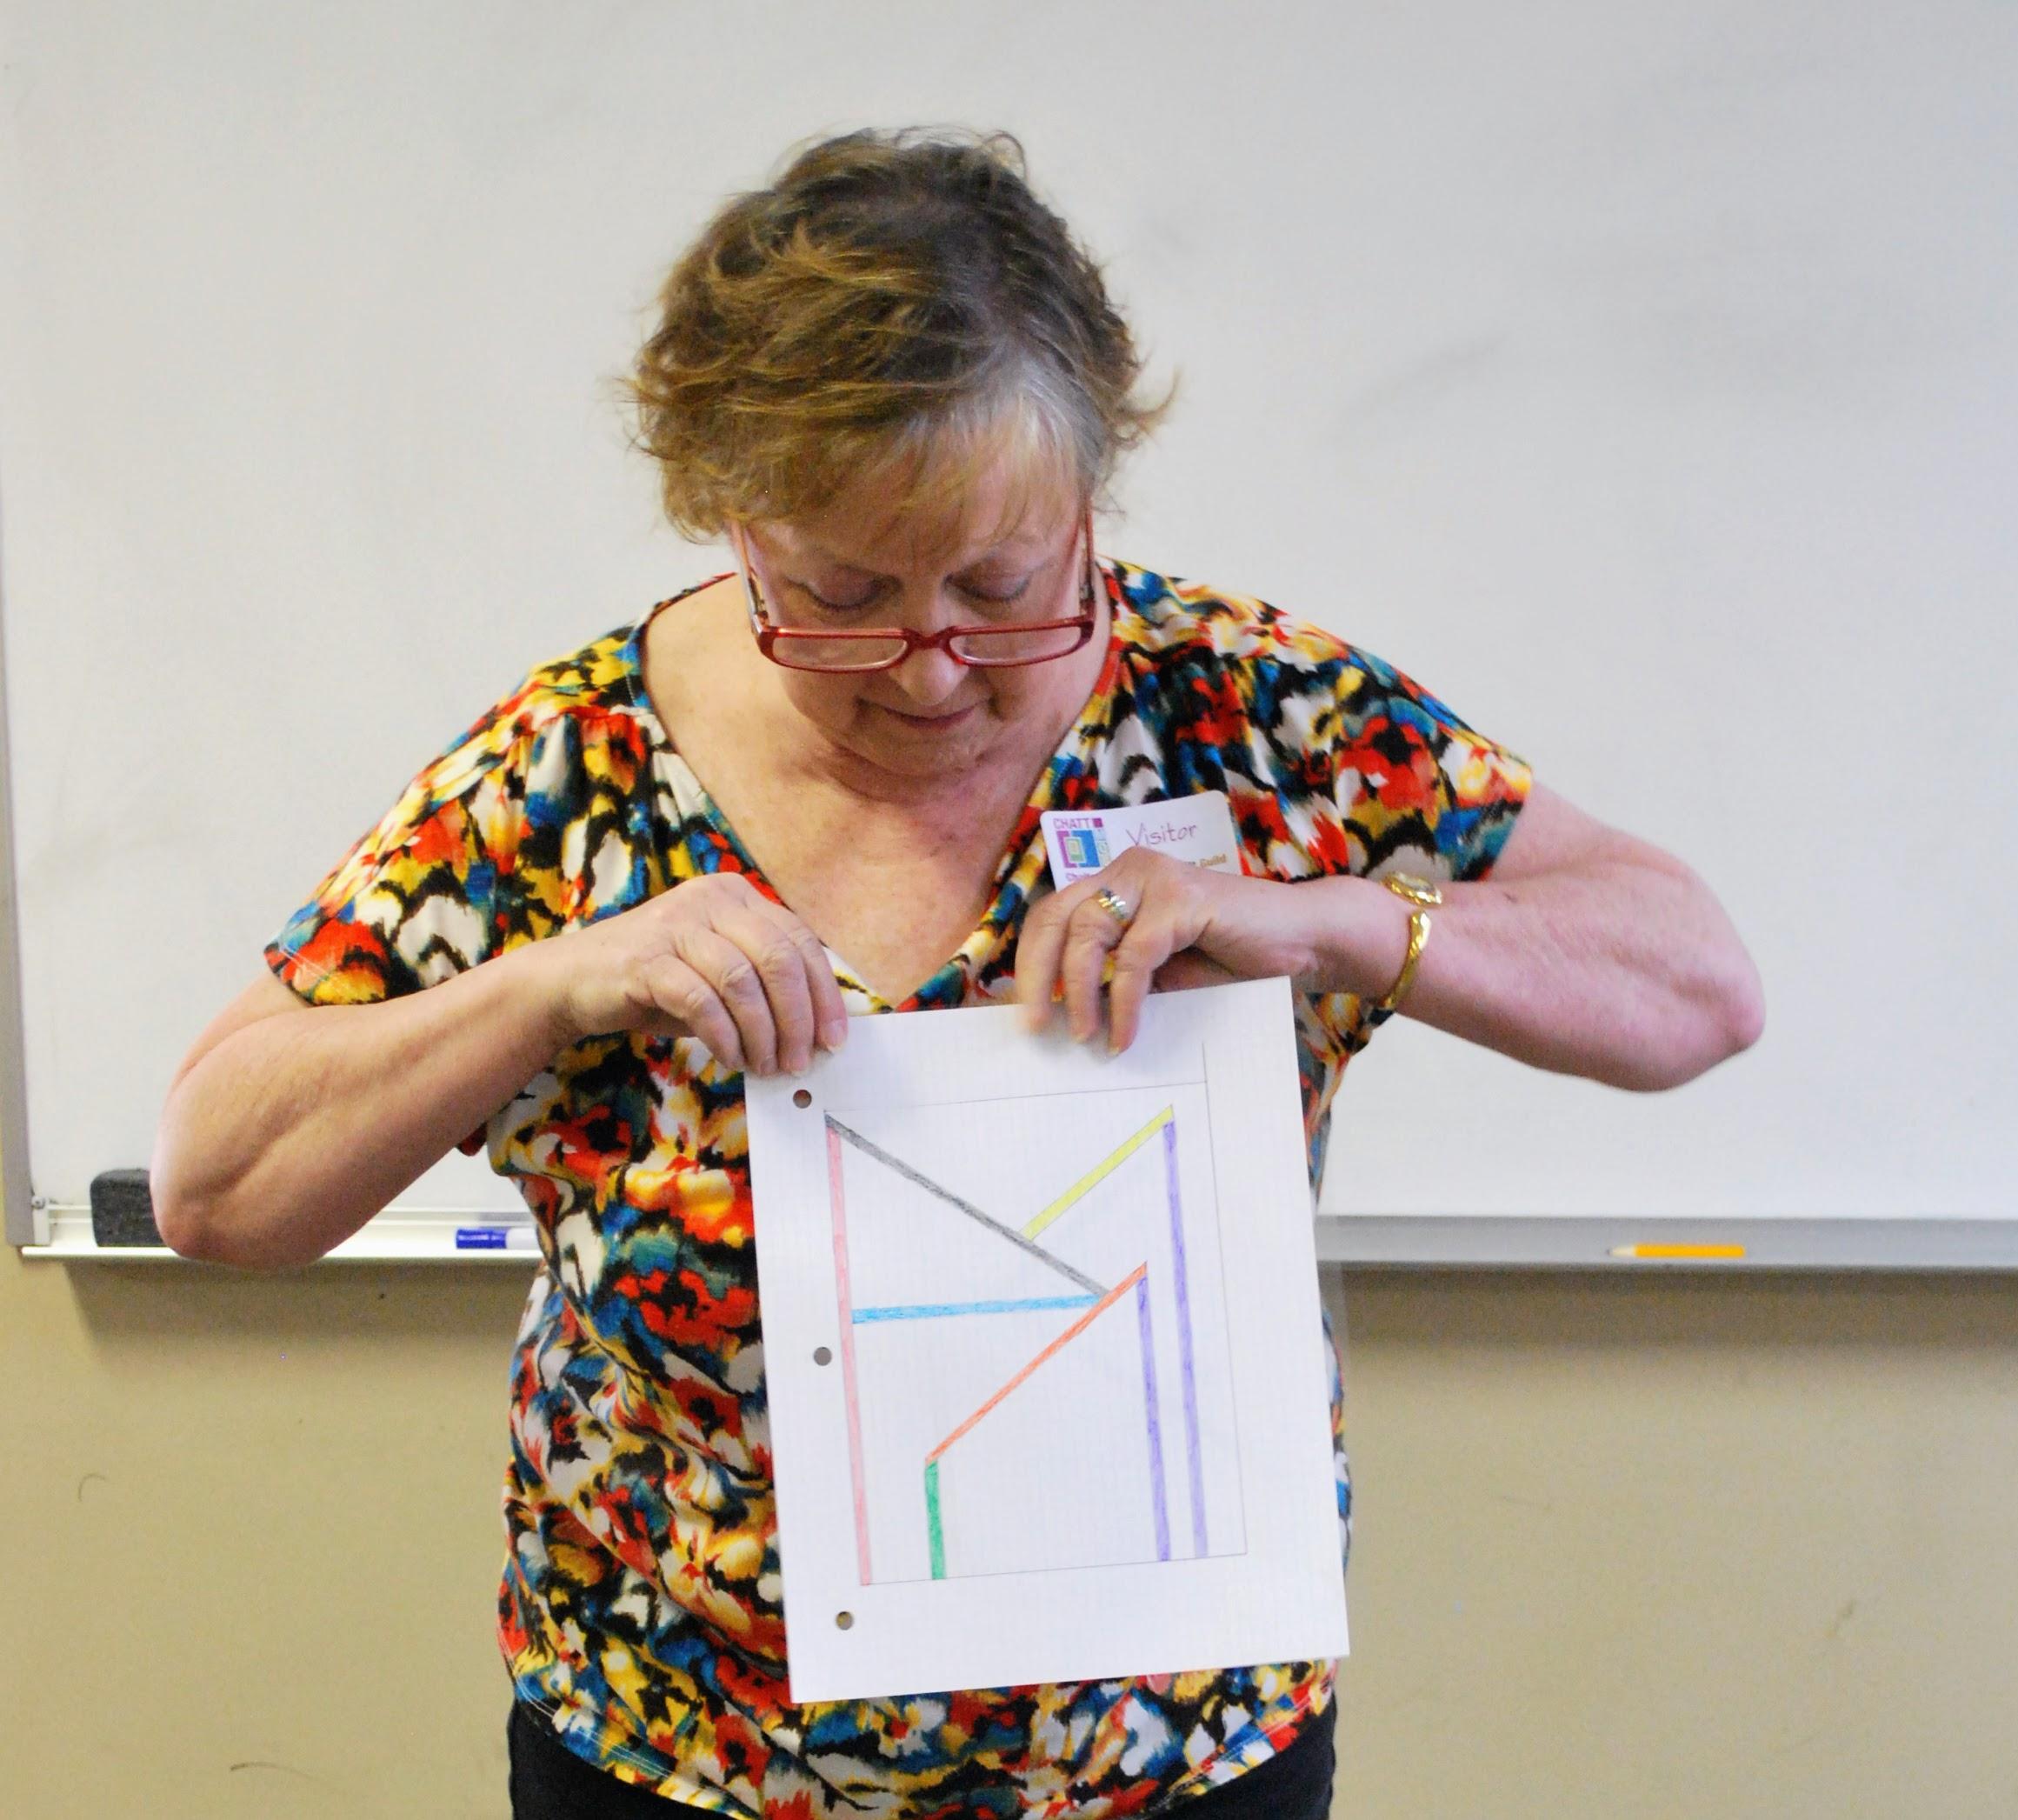 Rhonda Fulghum's initial minimalist design